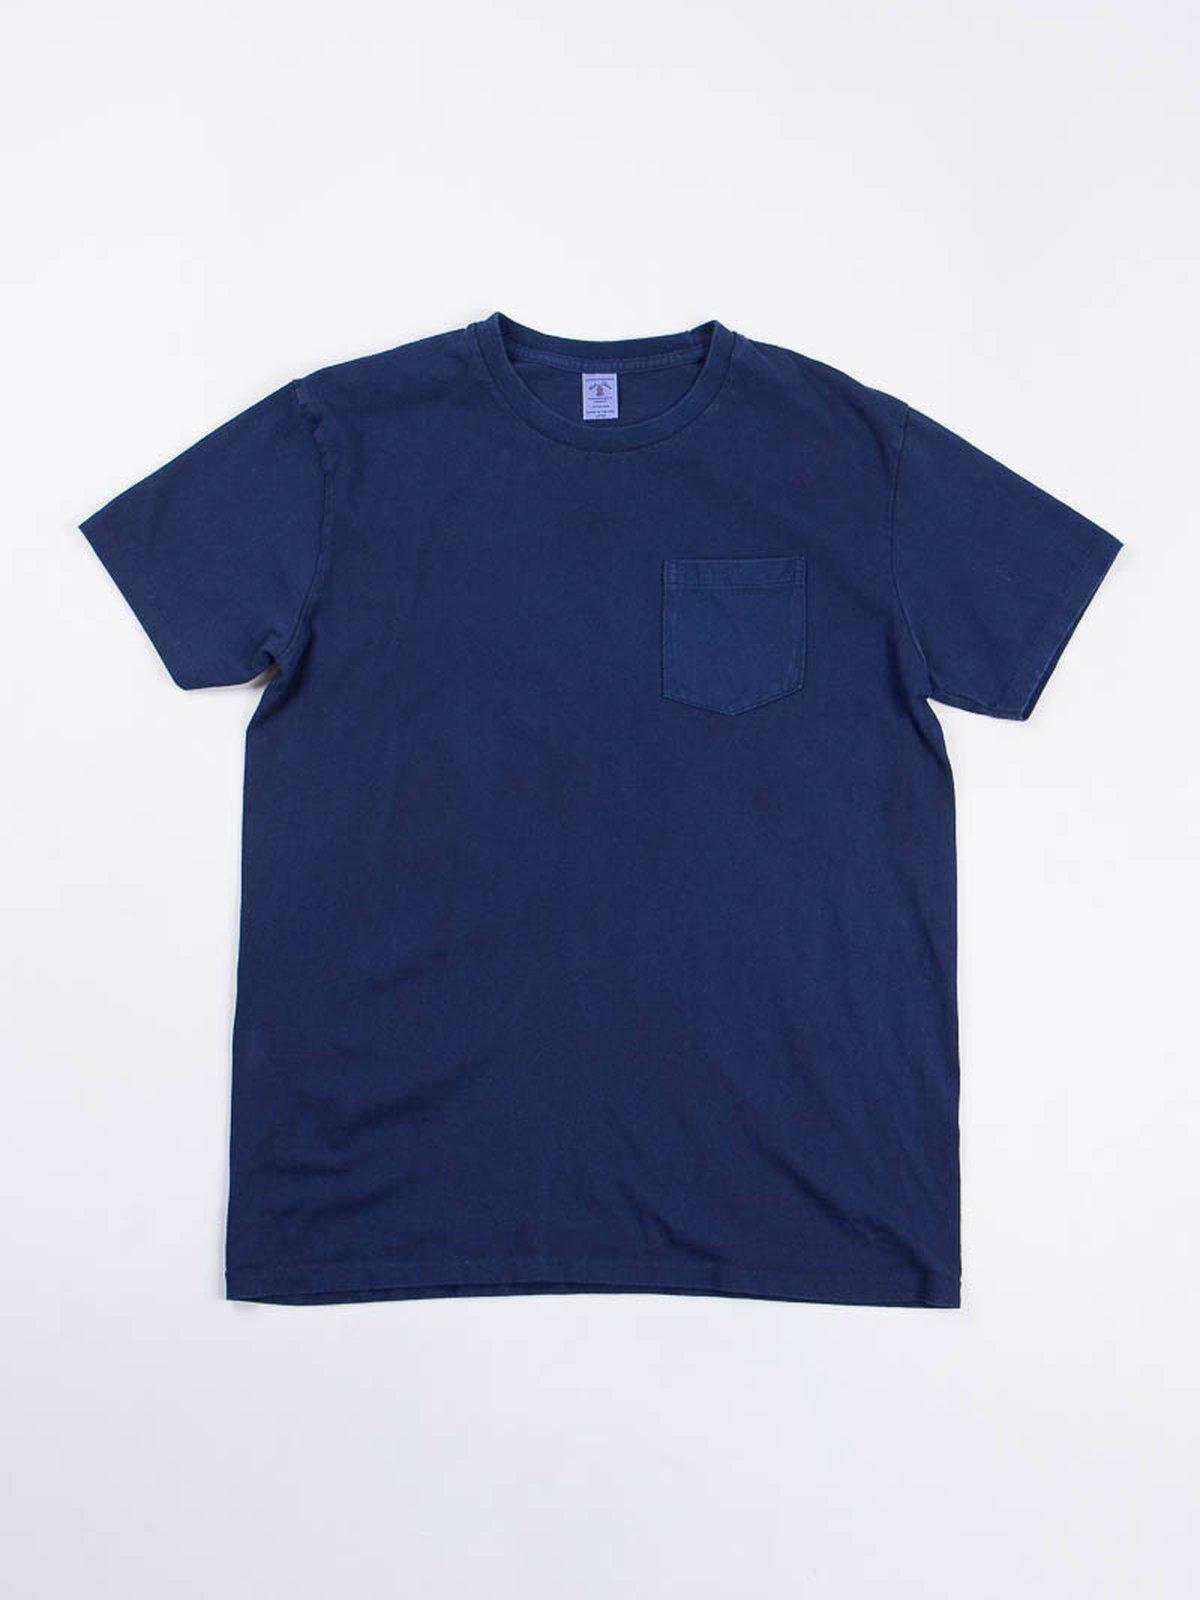 Blue Indigo 1–Pac Pocket Tee - Image 2